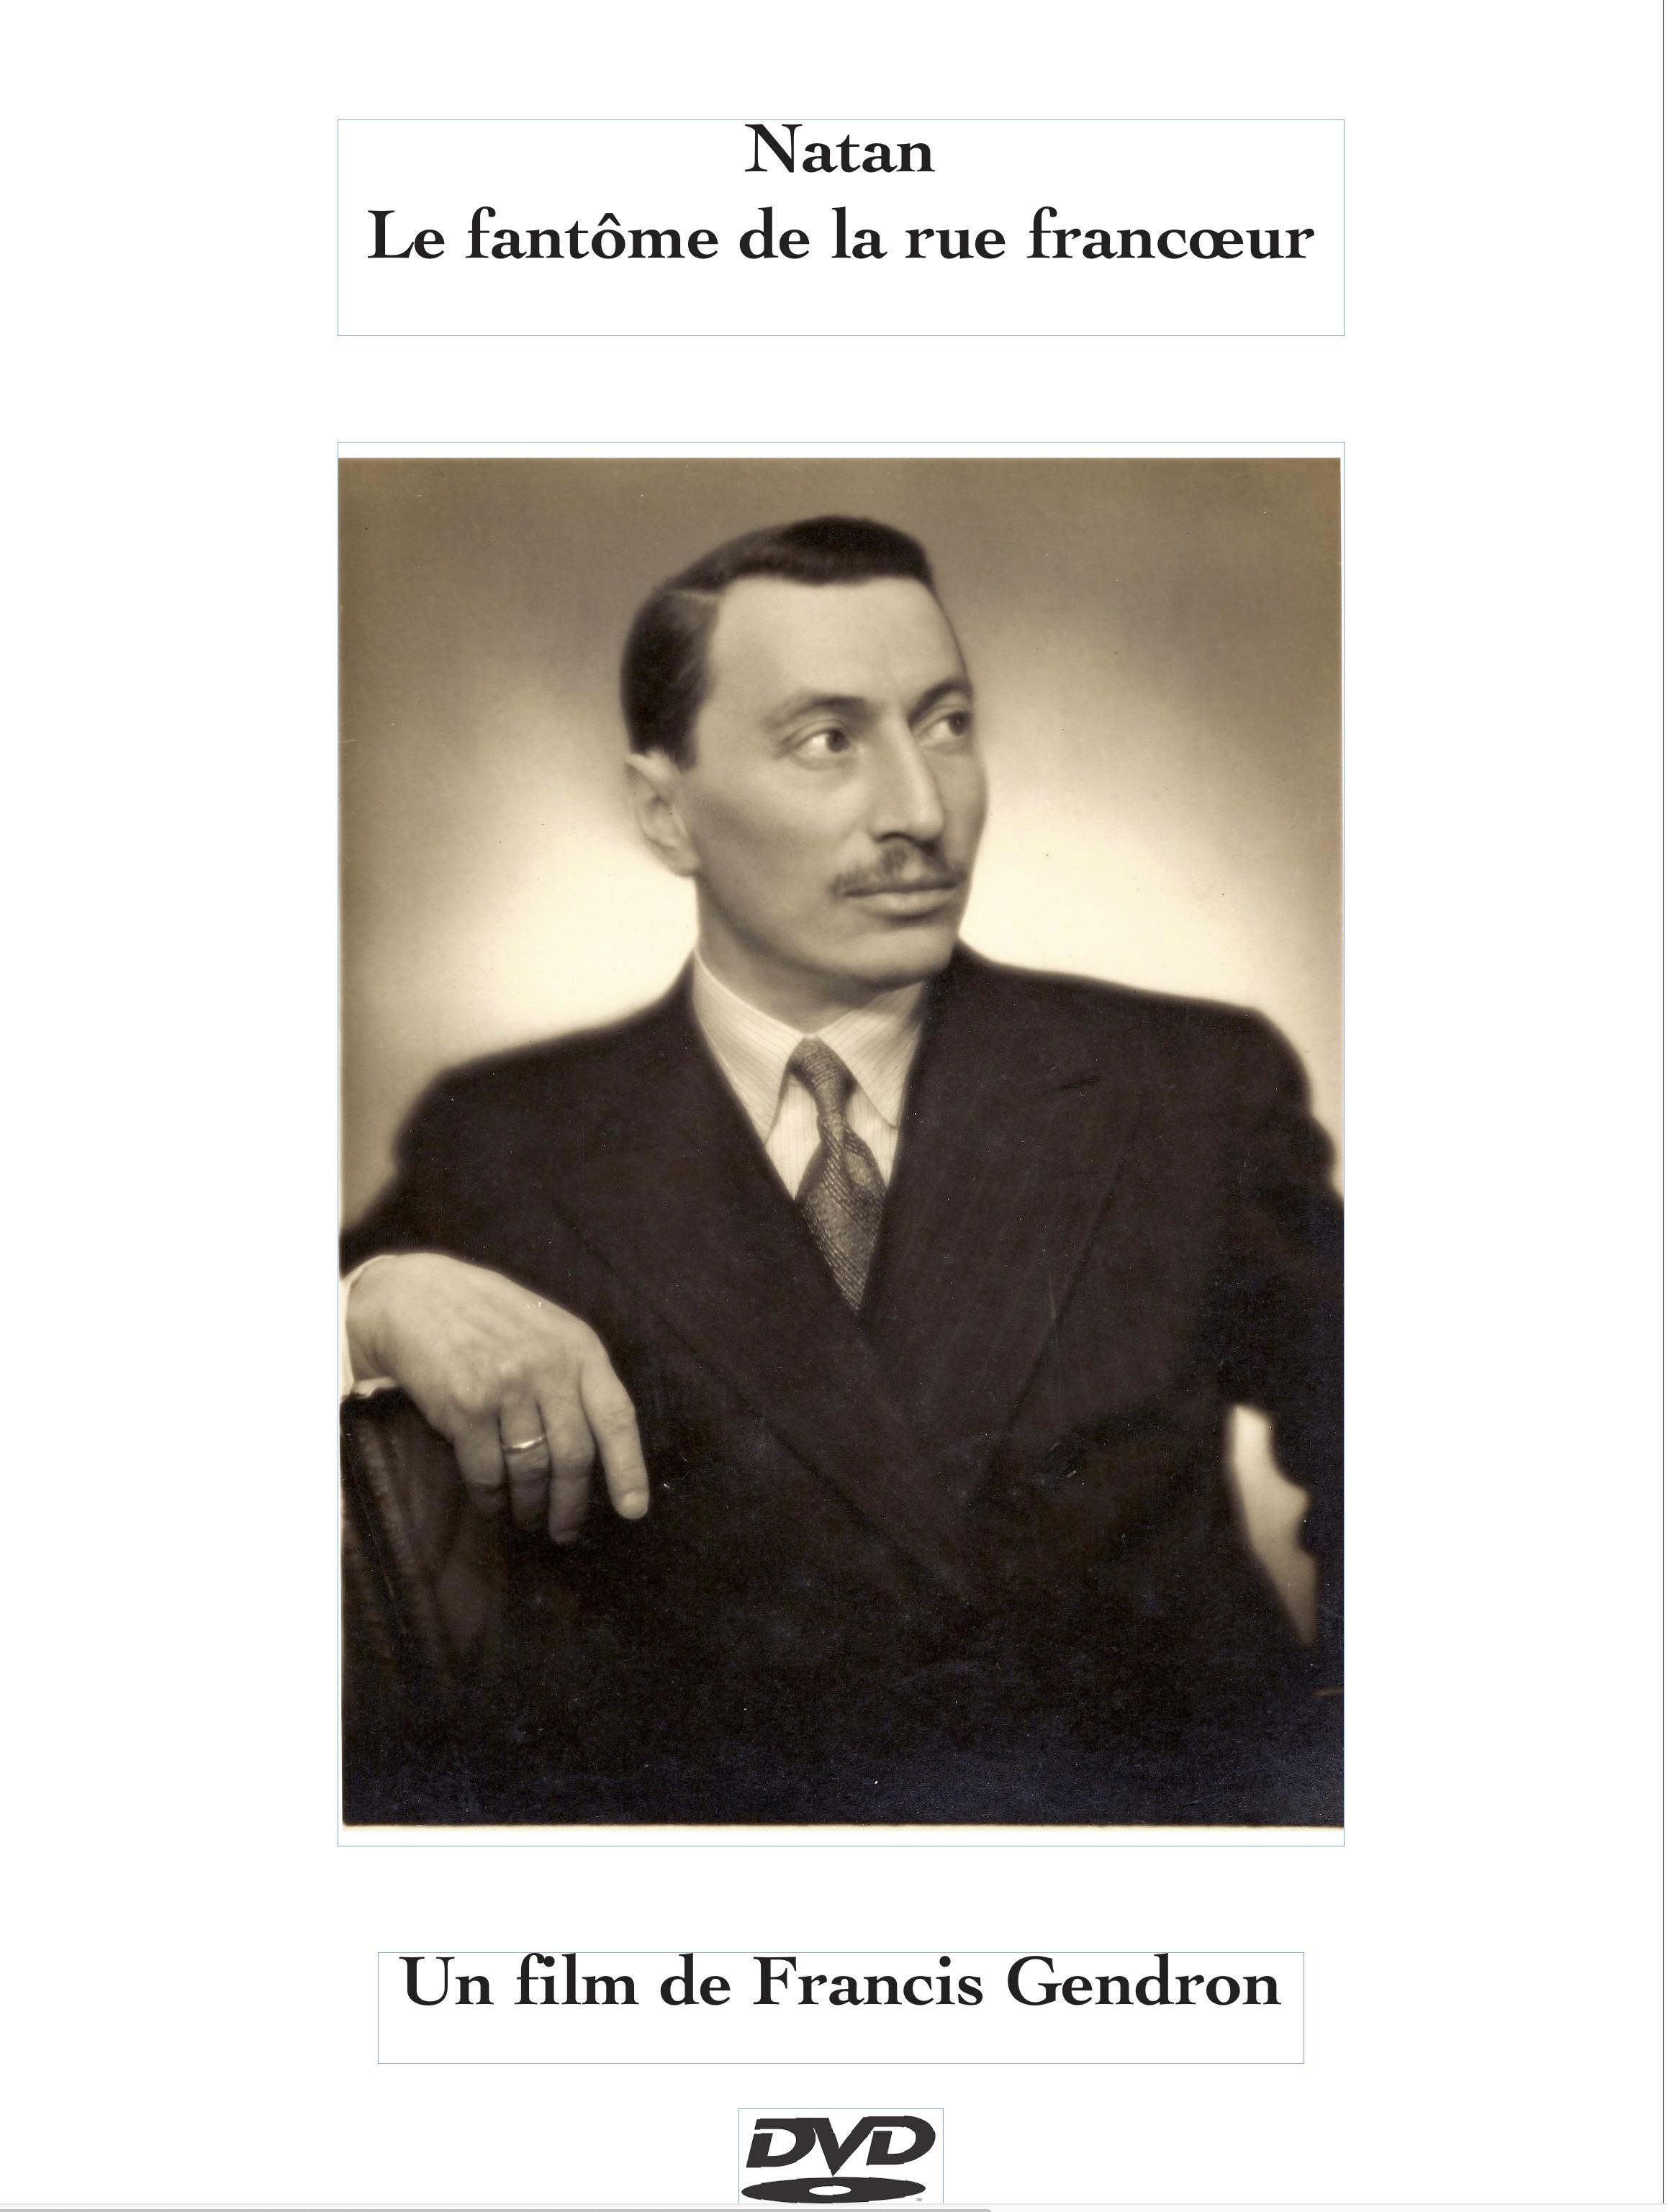 Bernard Natan, le fantôme de la rue Francoeur